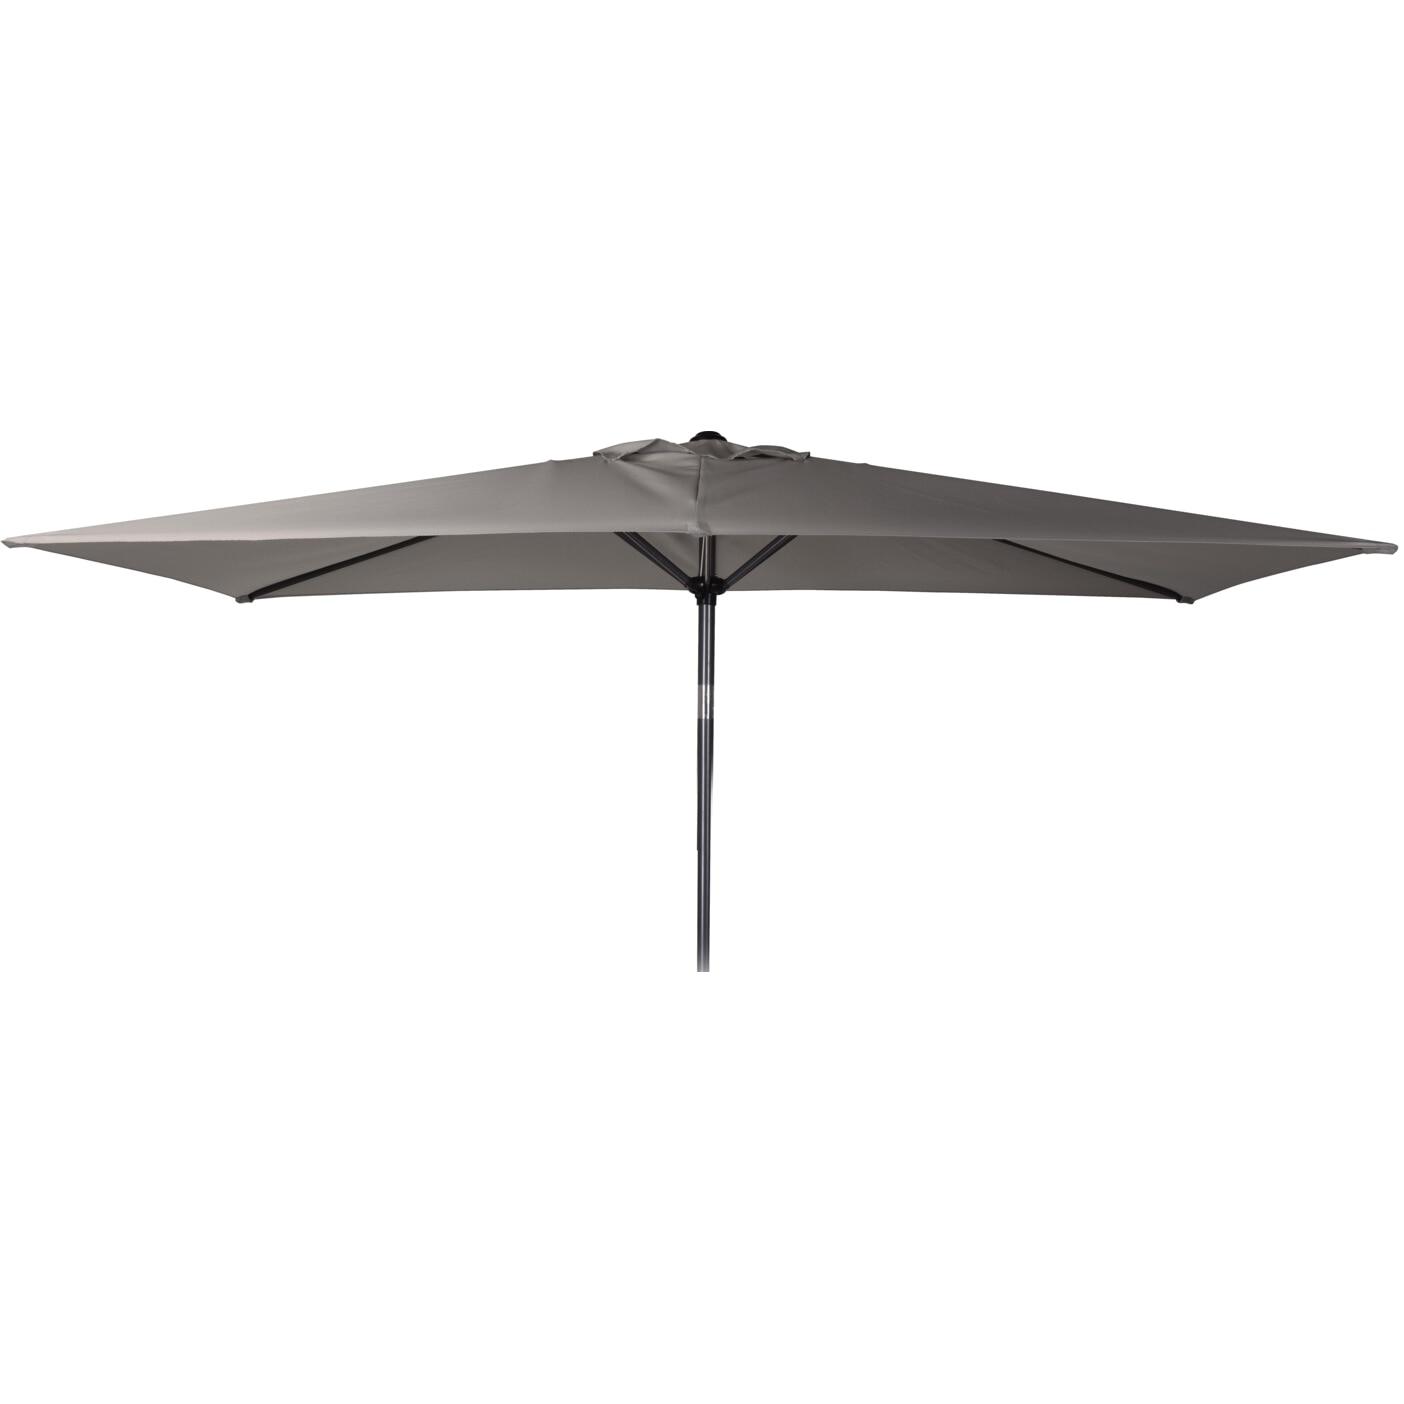 Fotografie Umbrela de soare Ambiance, 150x250cm, poliester 180 g/mp, gri deschis